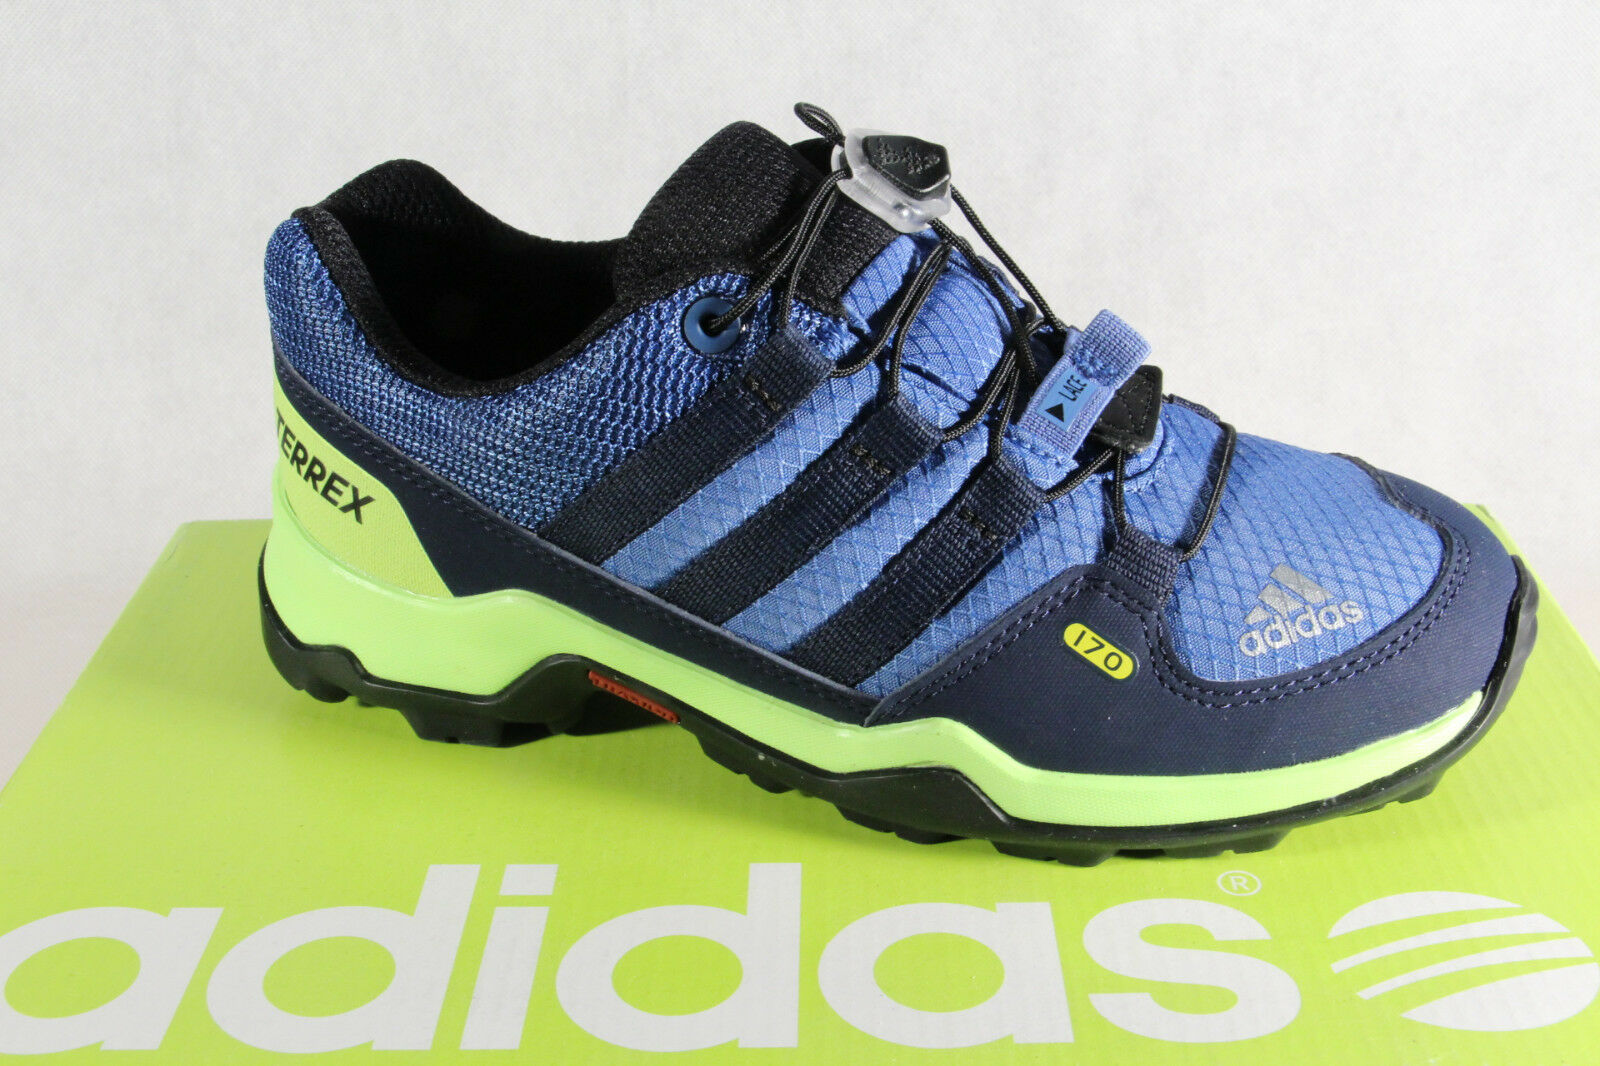 Adidas Terrex K Sautope all'aperto da Passeggiata Ginnastica Bluverde nuovo